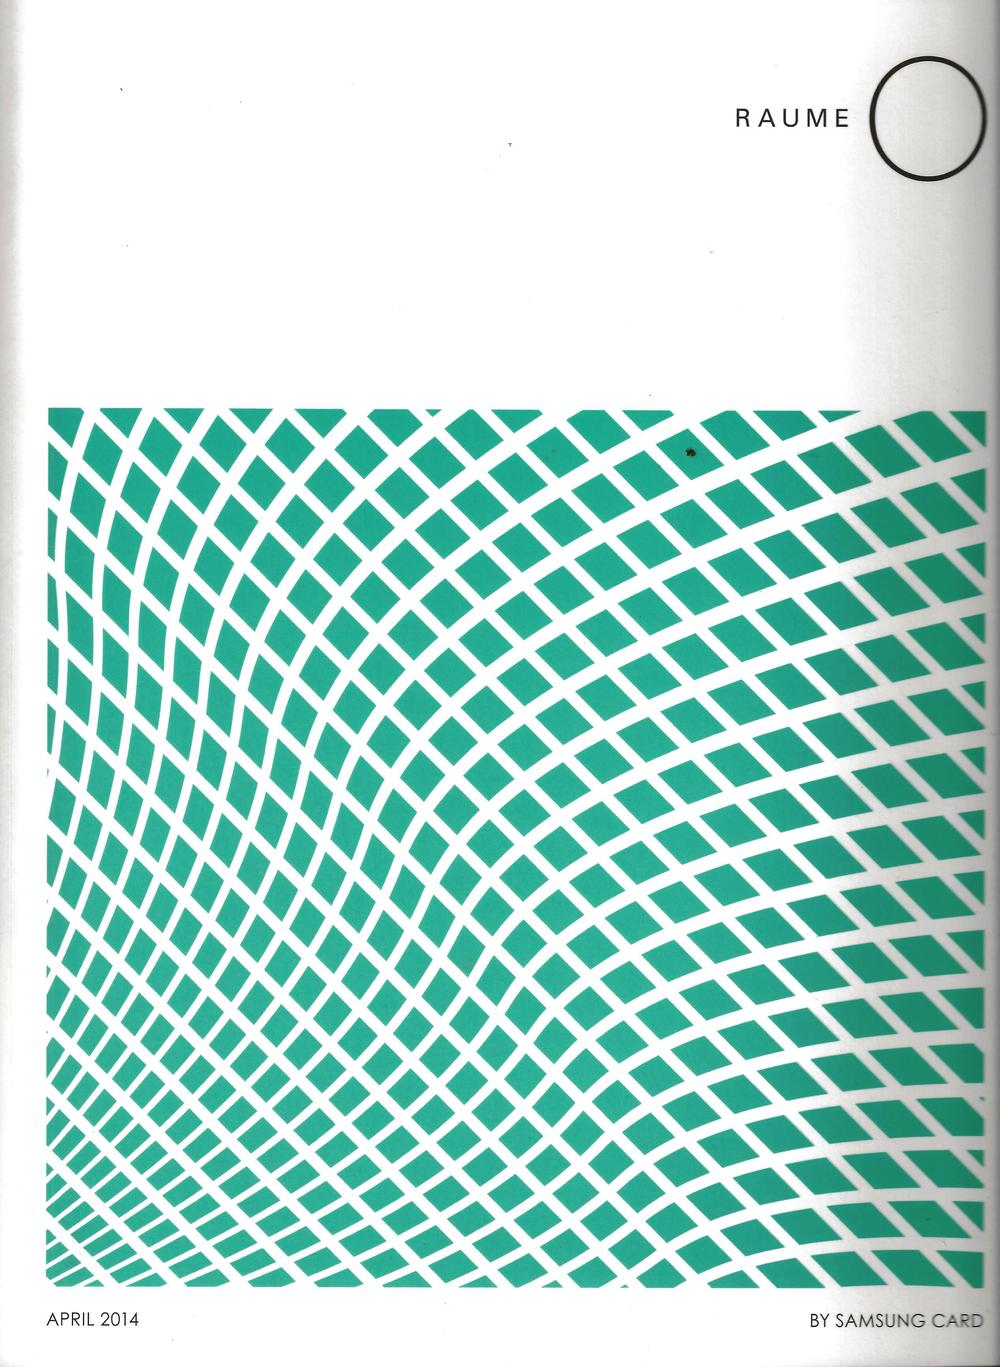 2014-11 Raume-Samsung card cover.jpg